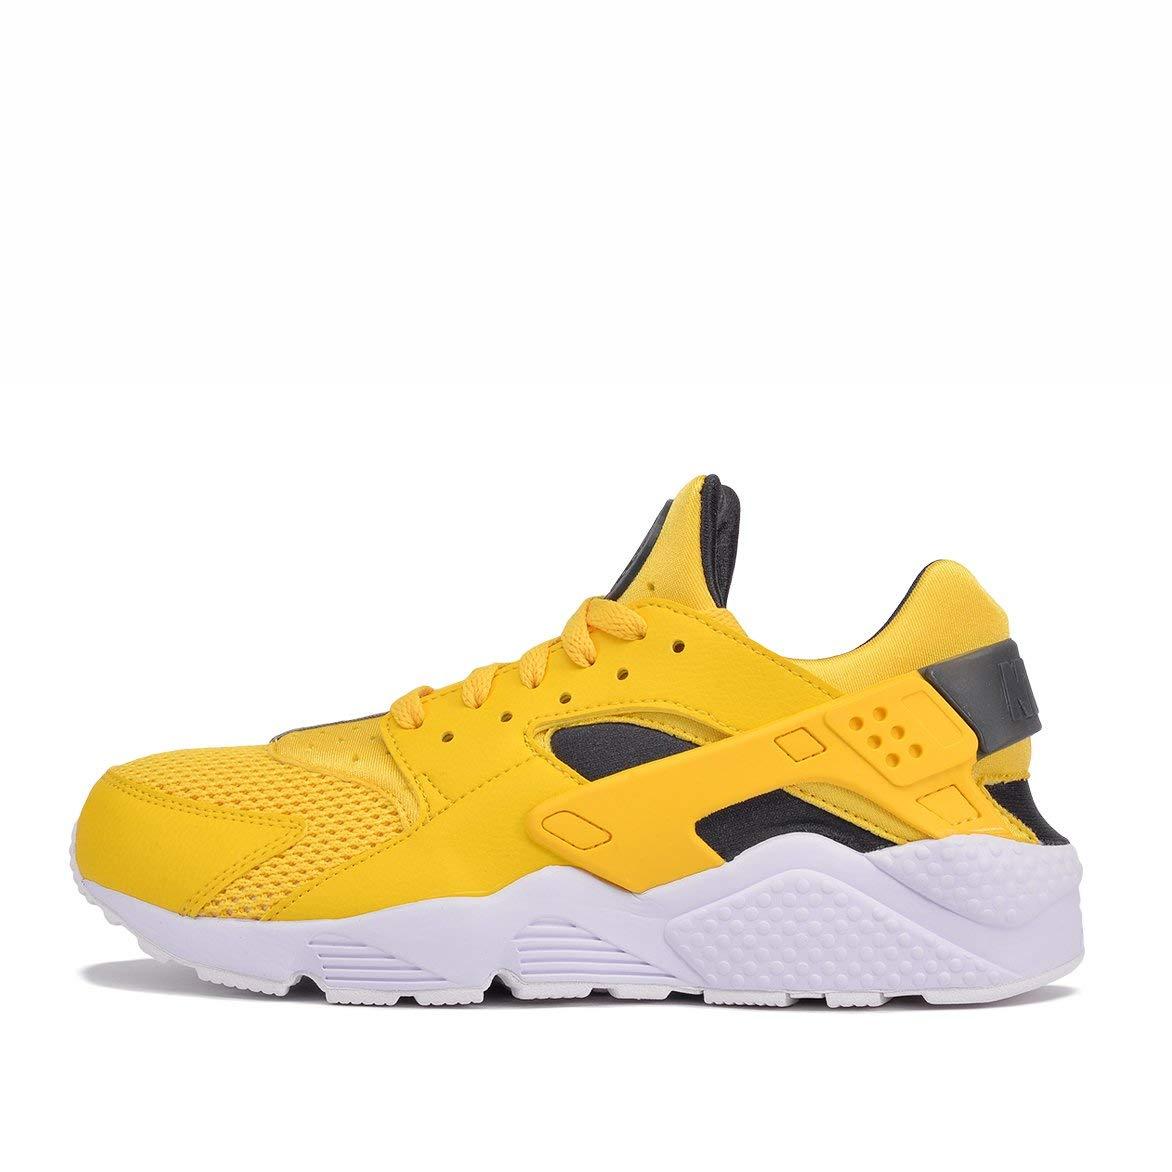 abc4e3e3f4bf5 Galleon - Nike Air Huarache Men's Running Shoes Tour Yellow/Anthracite-White  318429-700 (13 D(M) US)